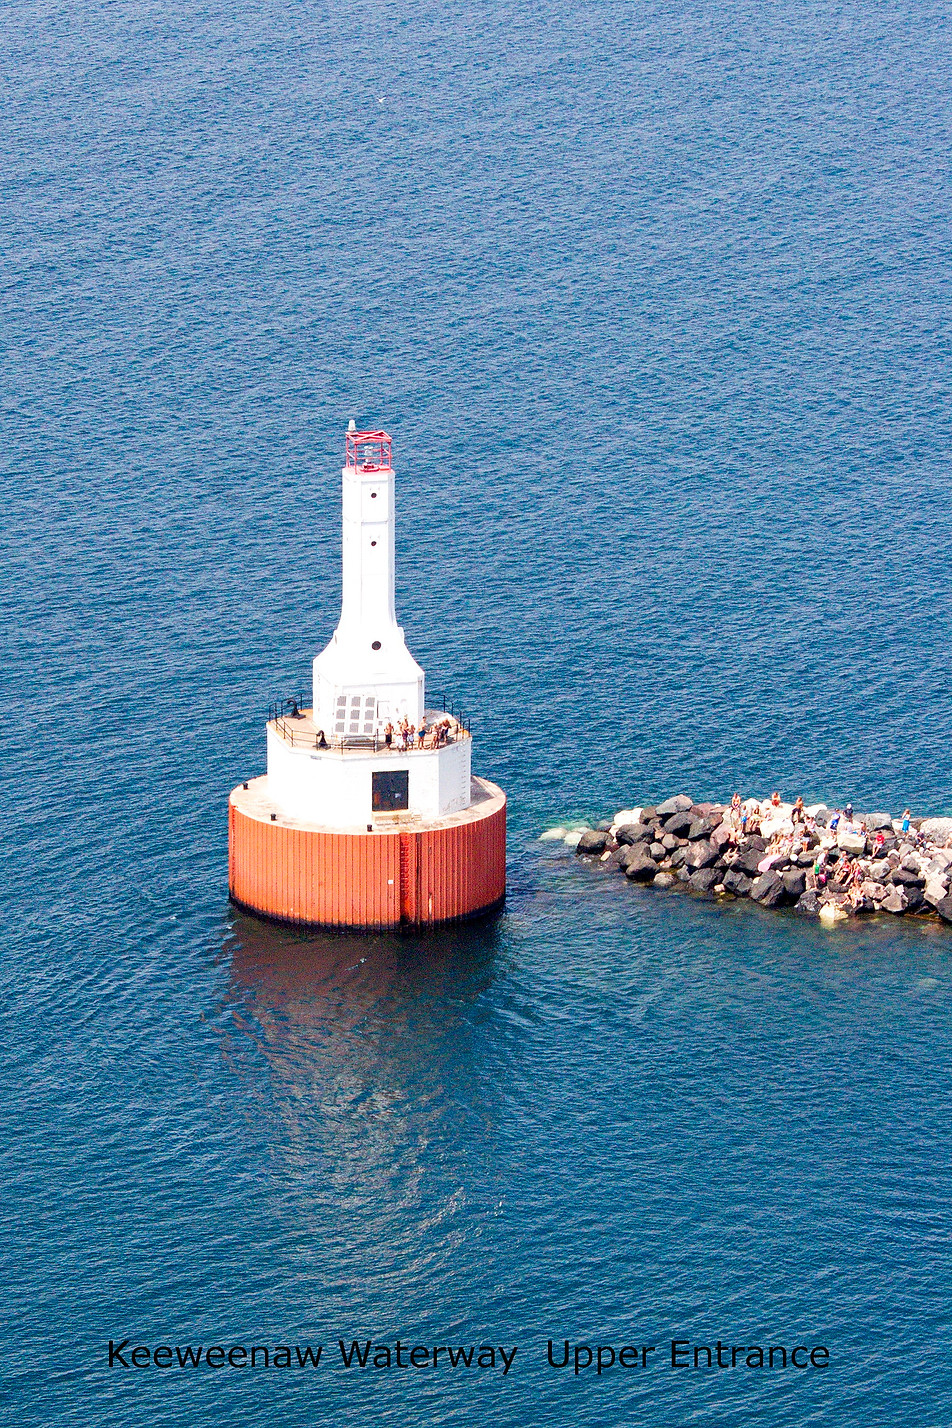 Keeweenaw Waterway Upper Entrance Lighthouse